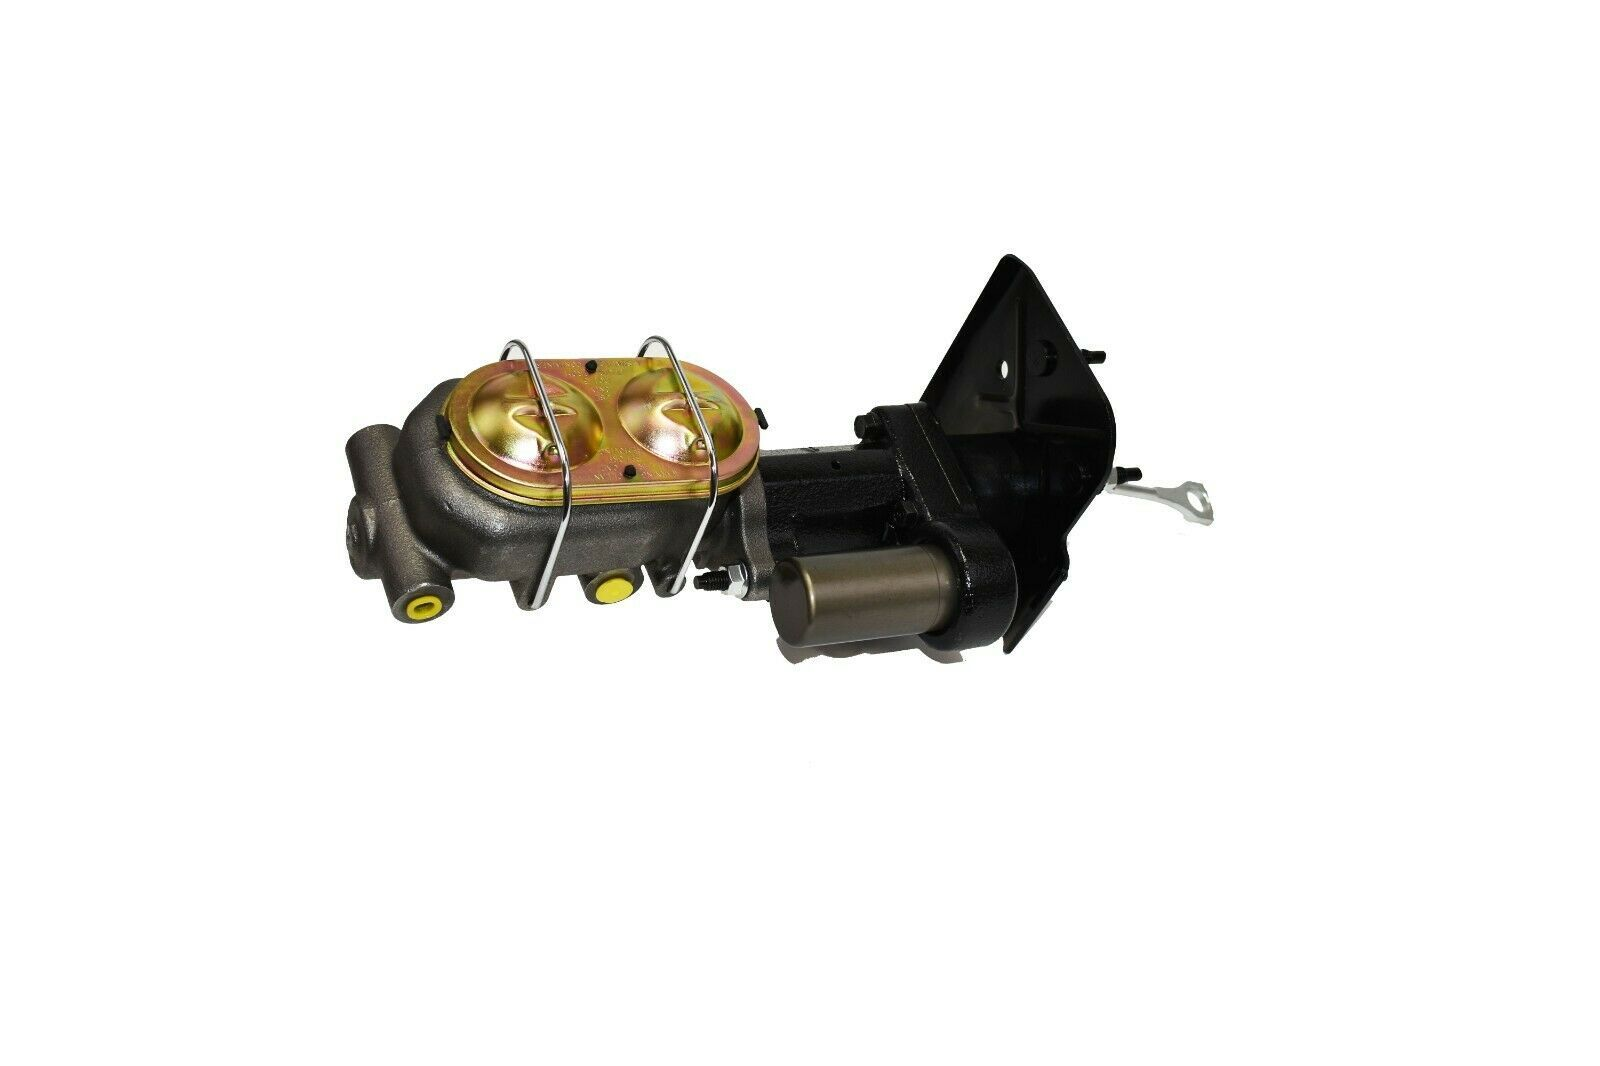 Universal Bosch Style Hydroboost Brake Power Booster Kit GMC, FORD, DODGE, CHEVY